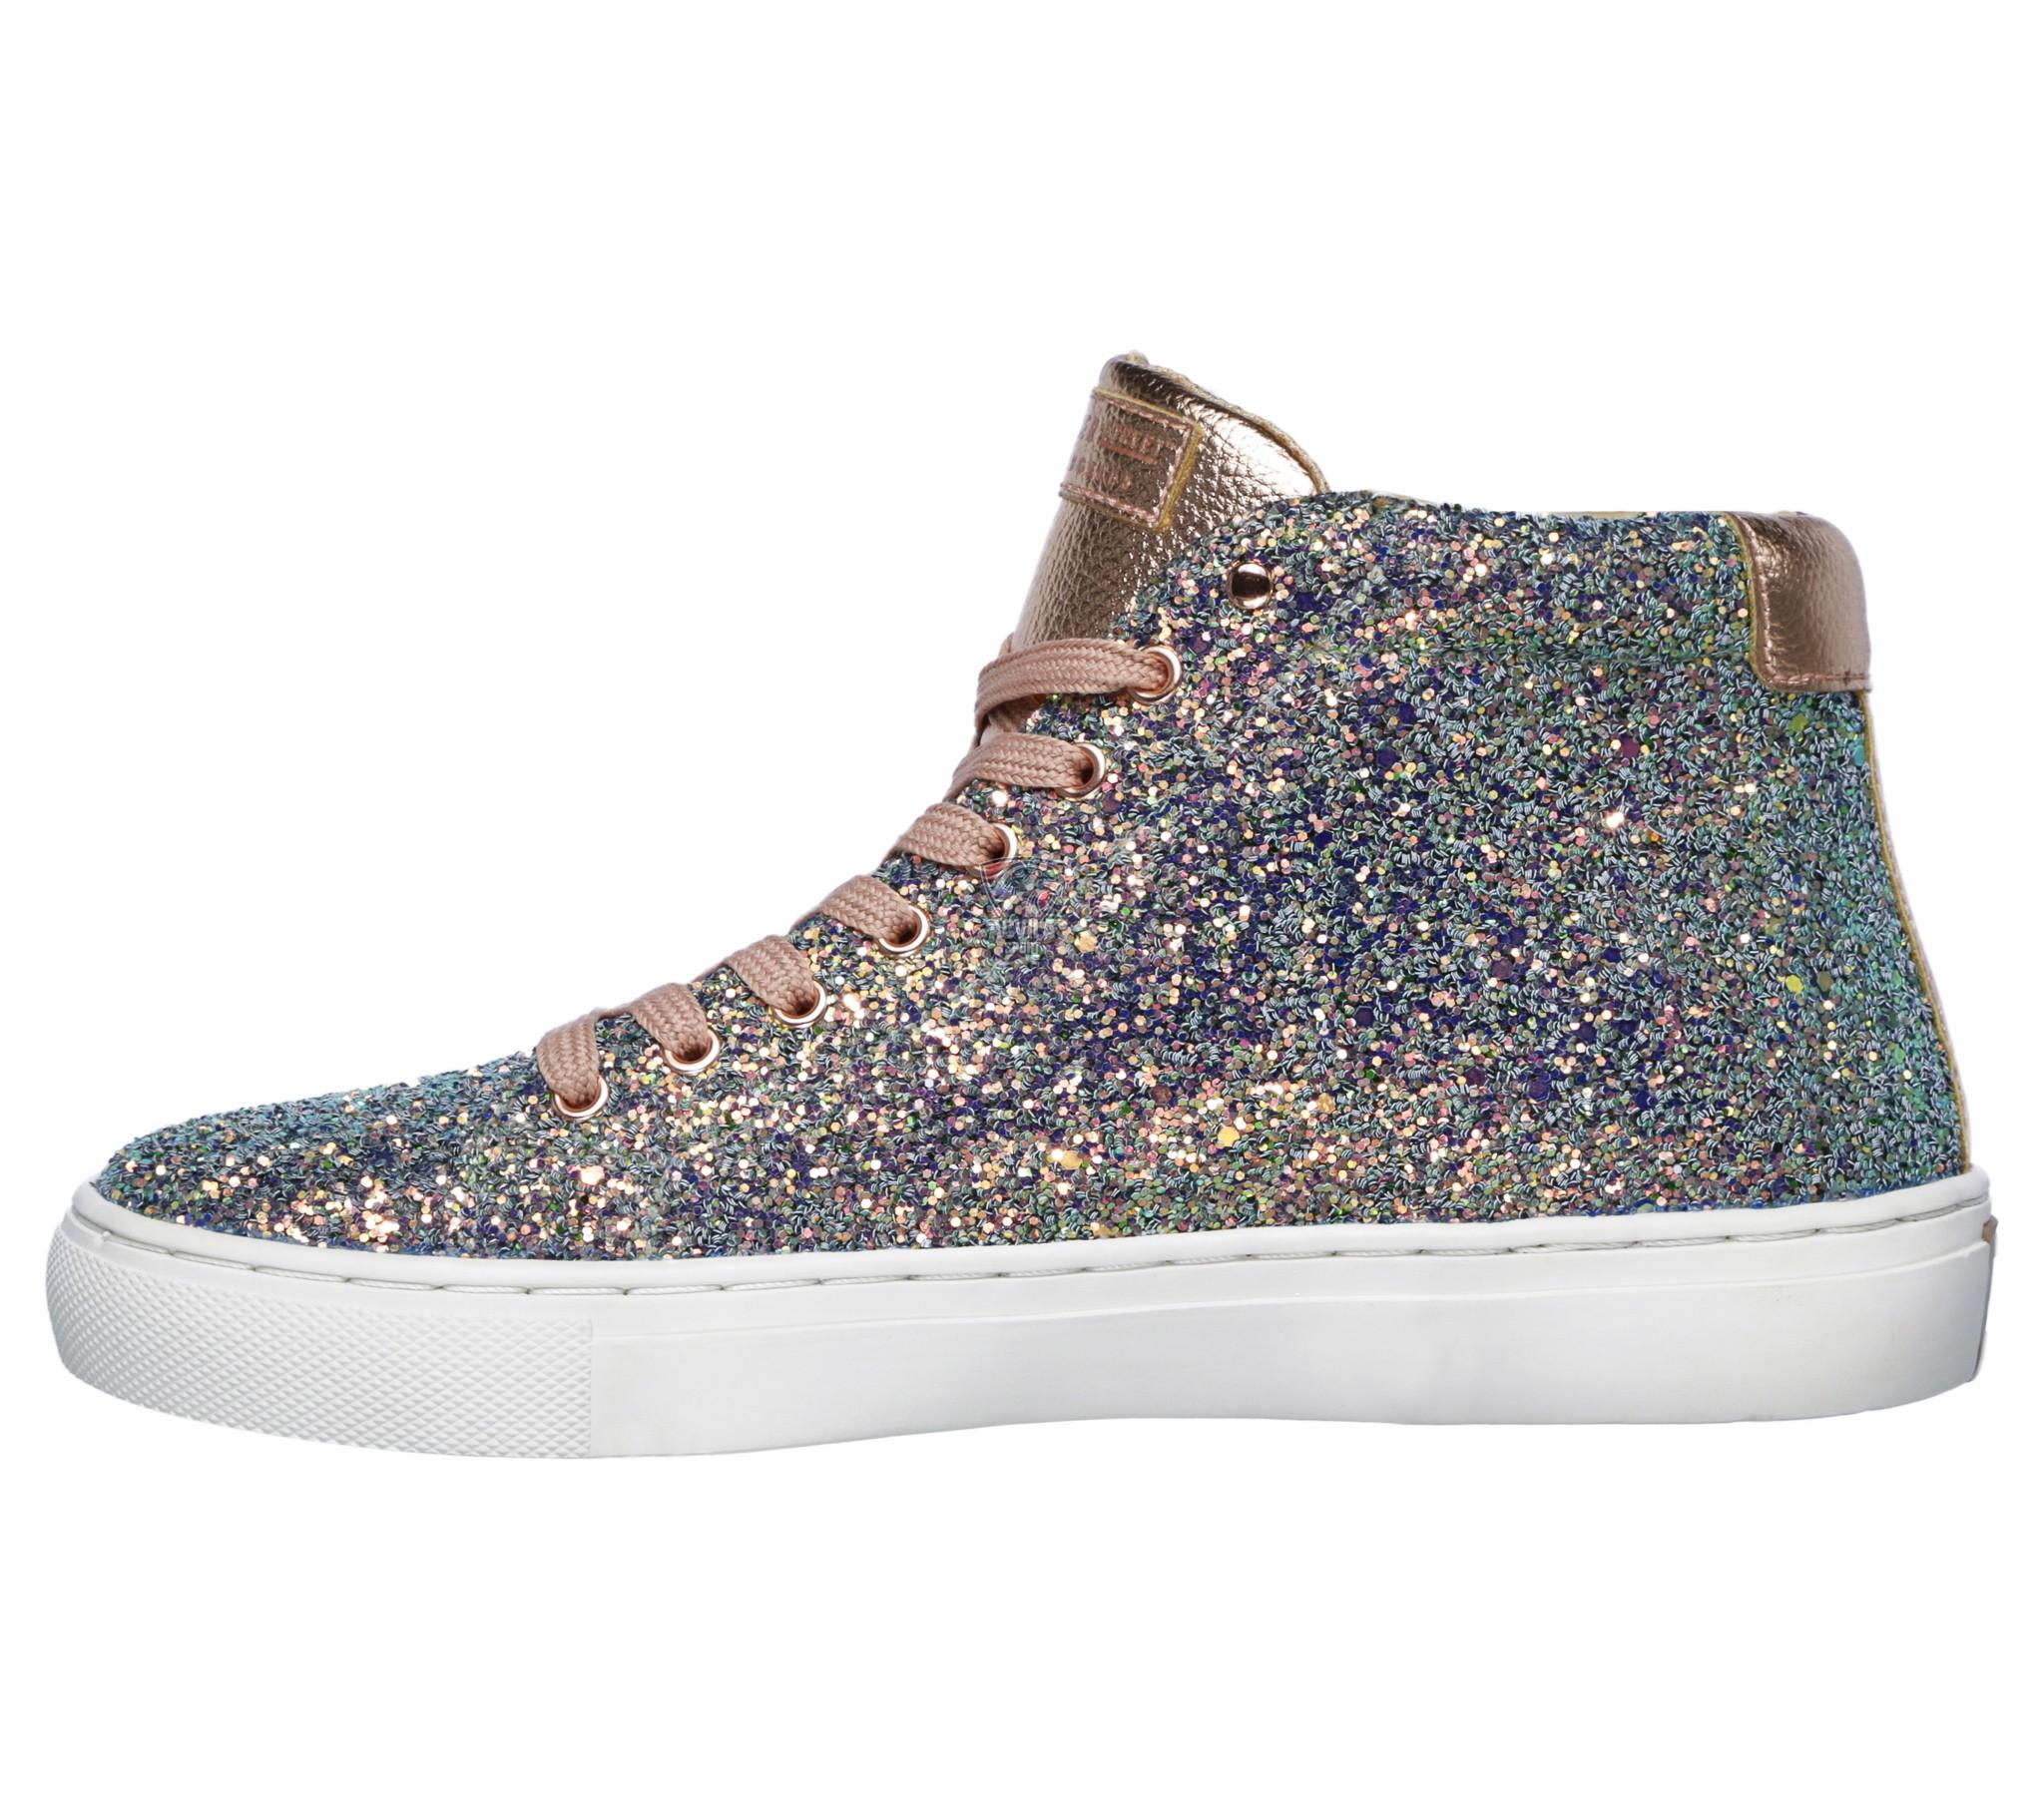 photo 2 Женская обувь SKECHERS SIDE STREET- NIGHT LIFE